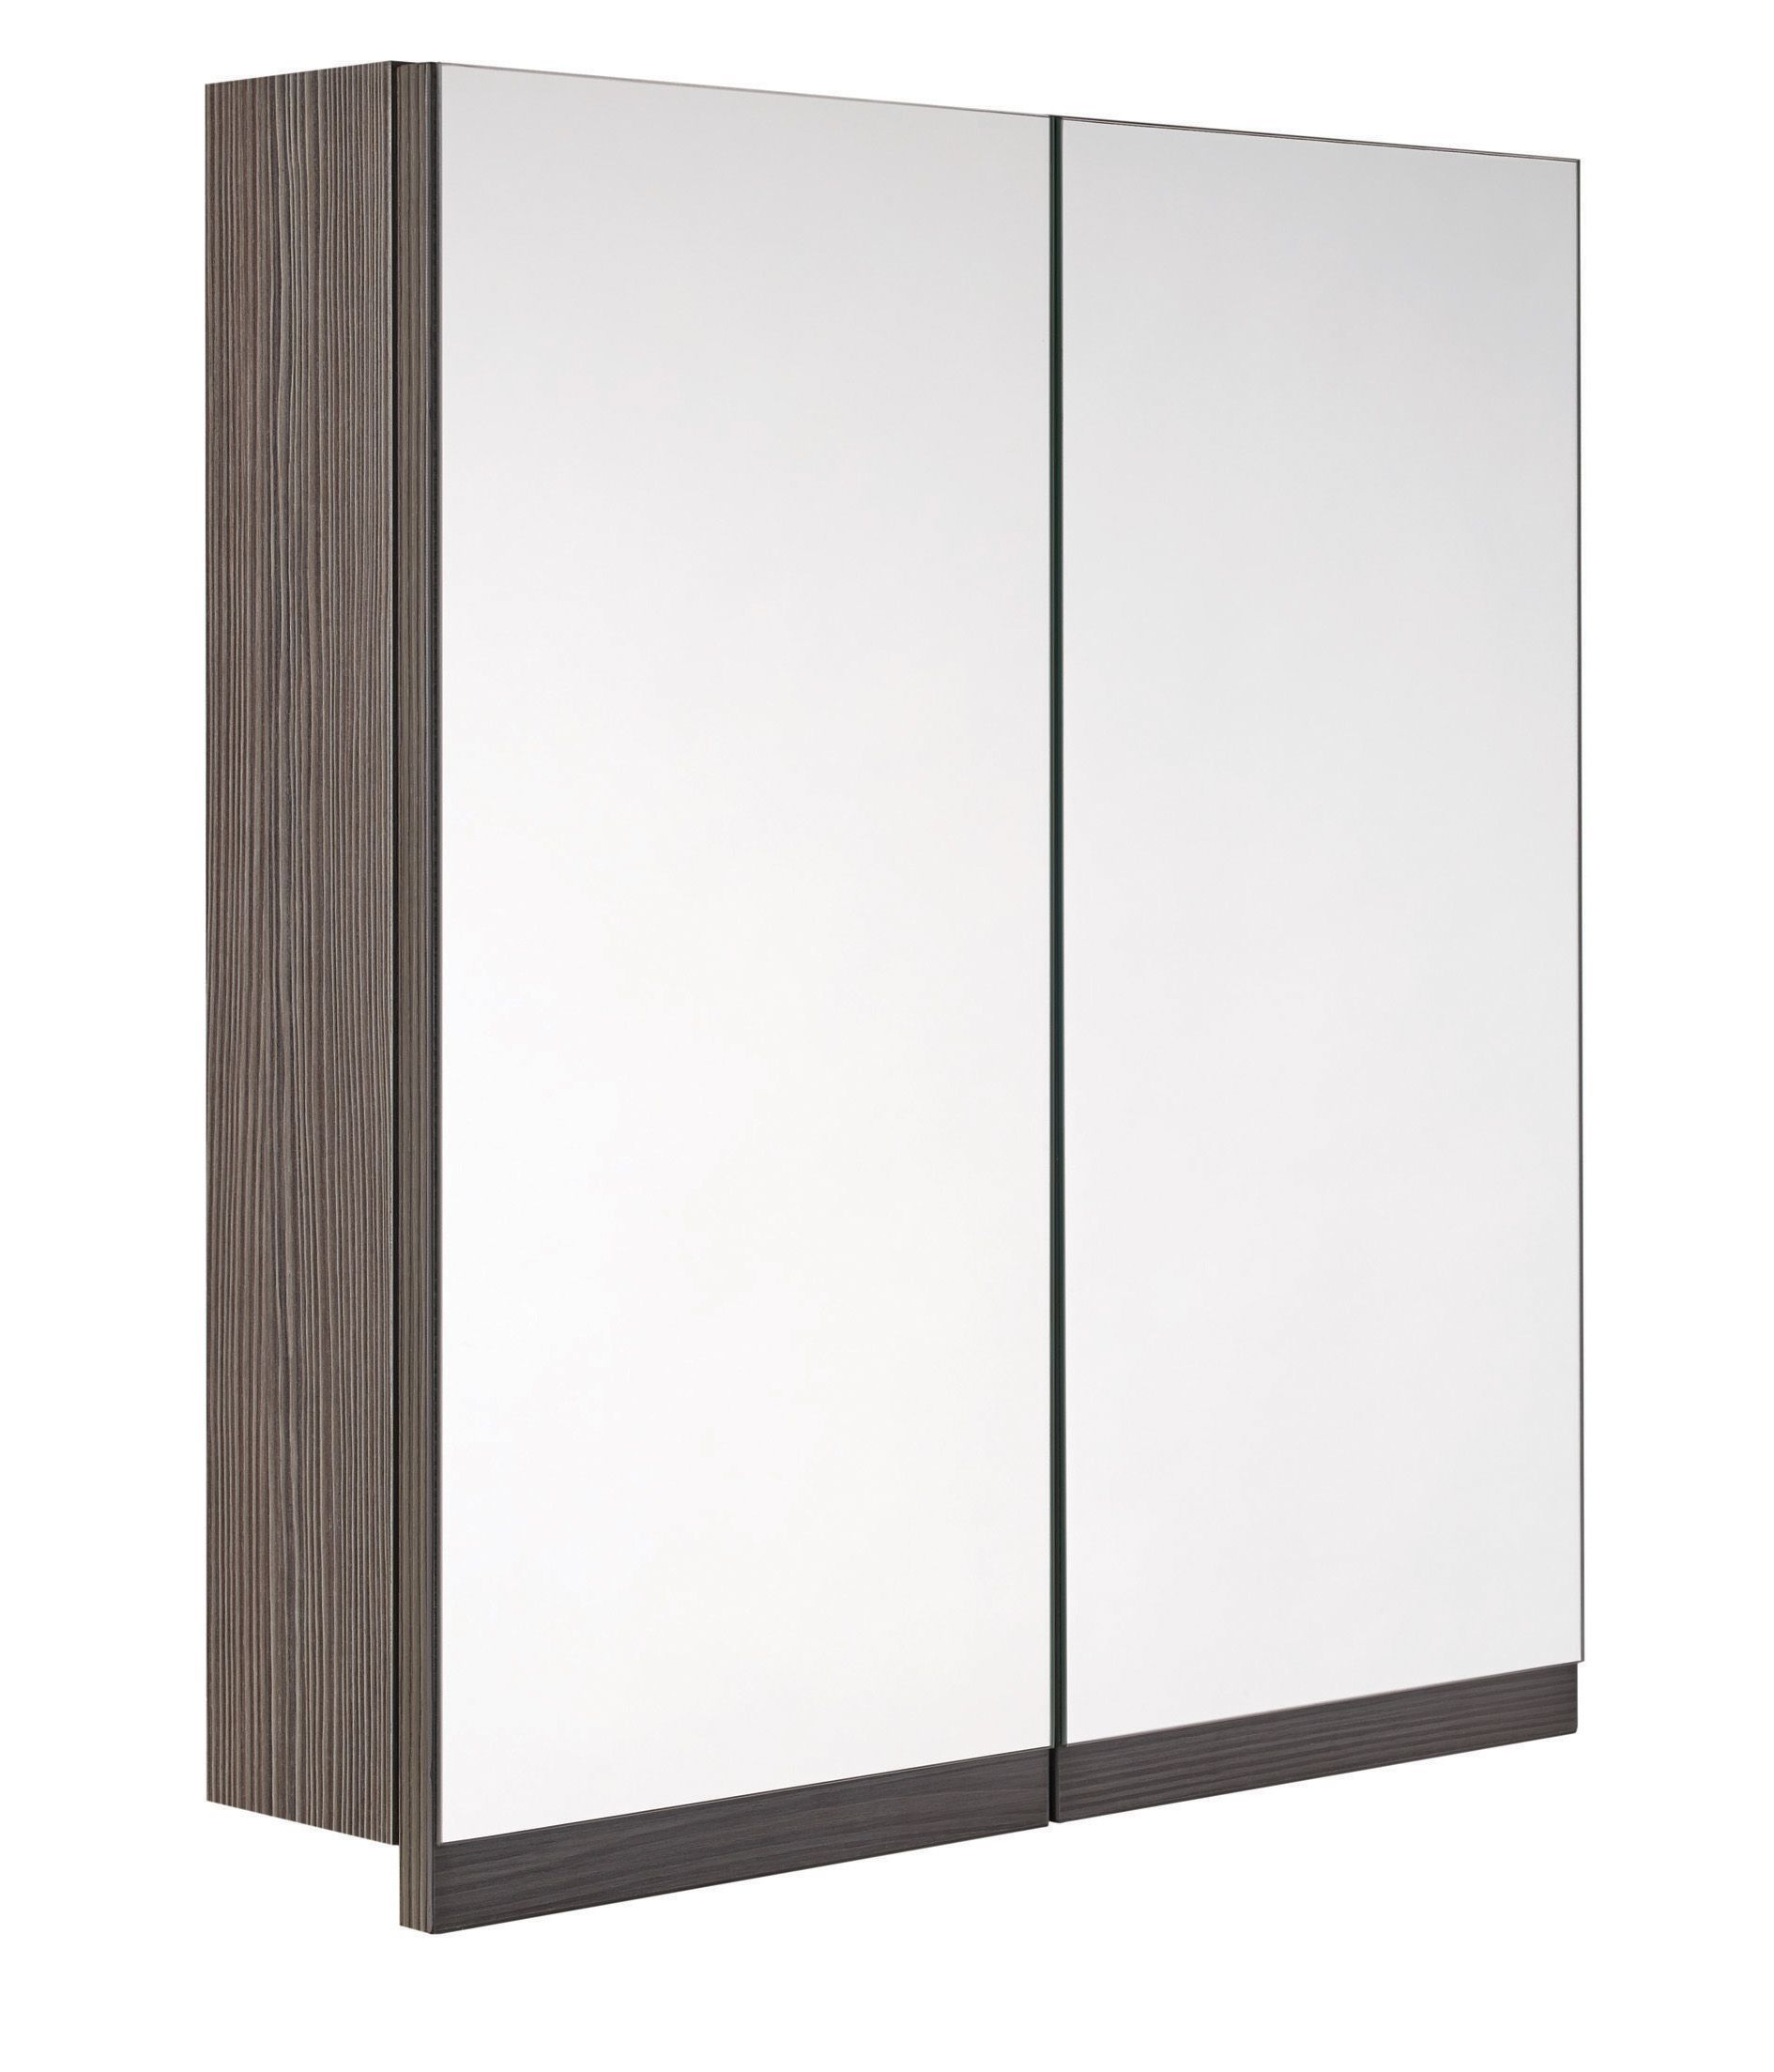 Cooke Lewis Ardesio Double Door Bodega Grey Mirror Cabinet